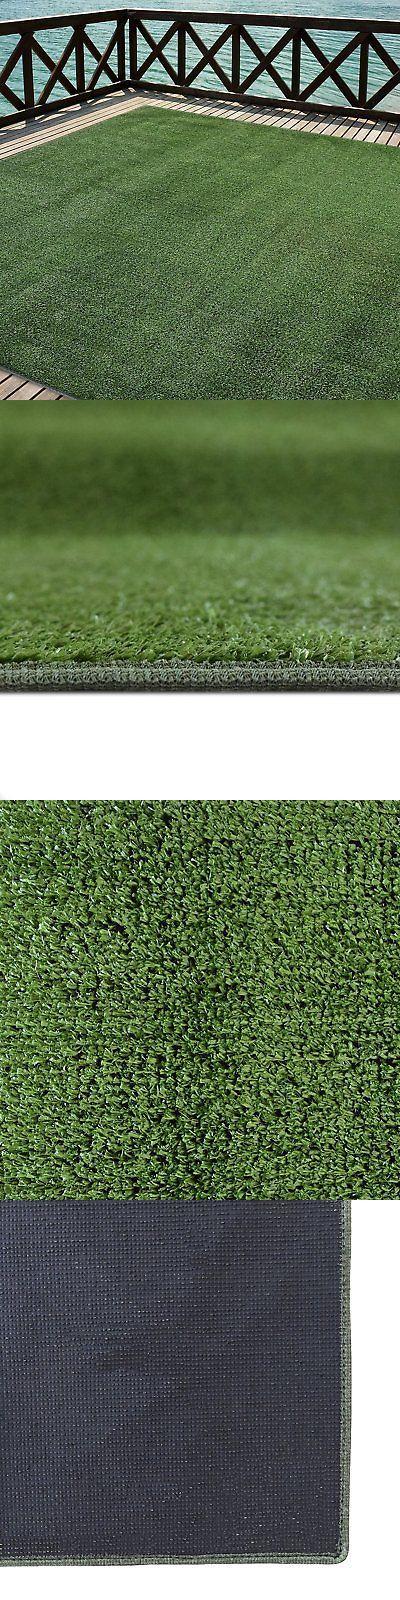 Synthetic Grass 181031: Outdoor Turf Rug Green Artificial Grass Indoor Deck  Patio Carpet Mat 12